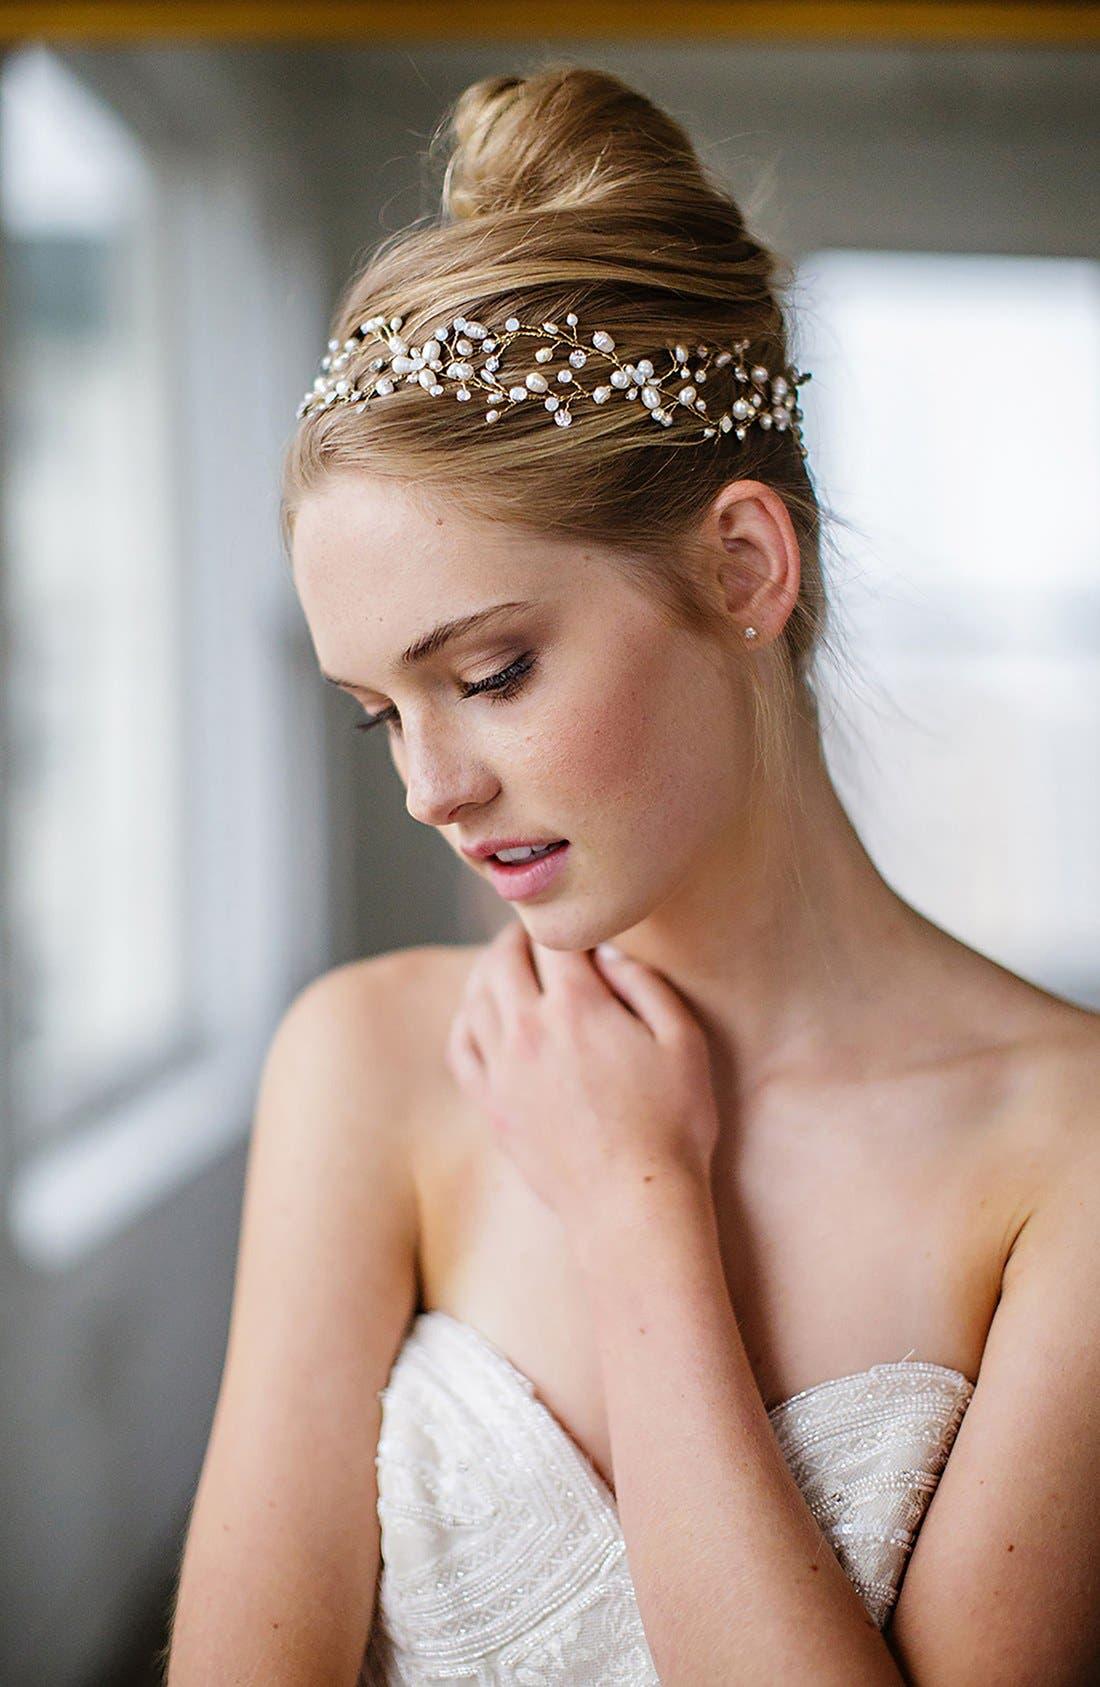 Brides & Hairpins 'Arabella' Jeweled Halo & Sash